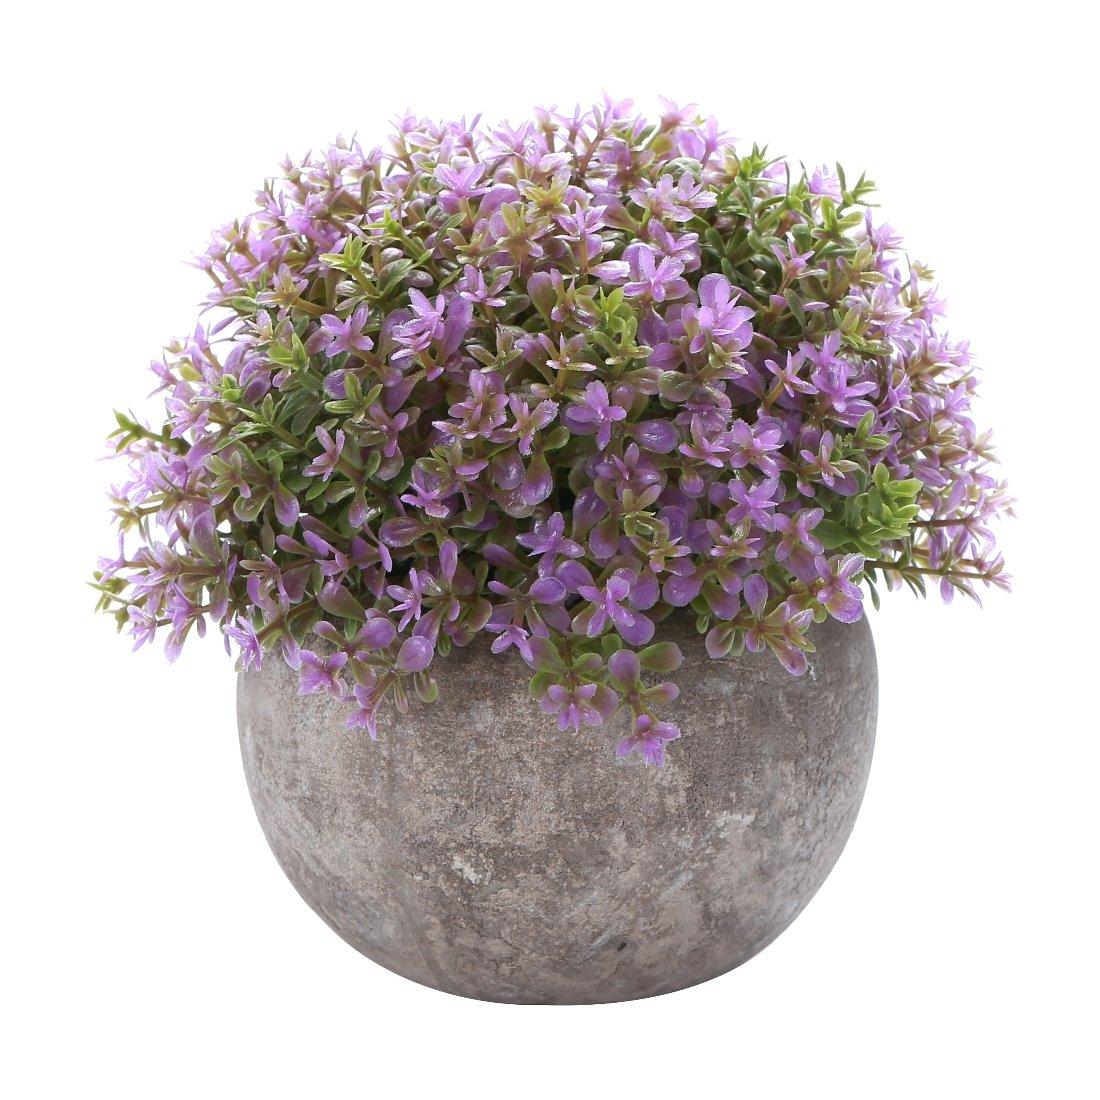 HC STAR Artificial Plant Potted Mini Fake Plant Decorative Lifelike Flower Green Plants - 1201 HCSTAR